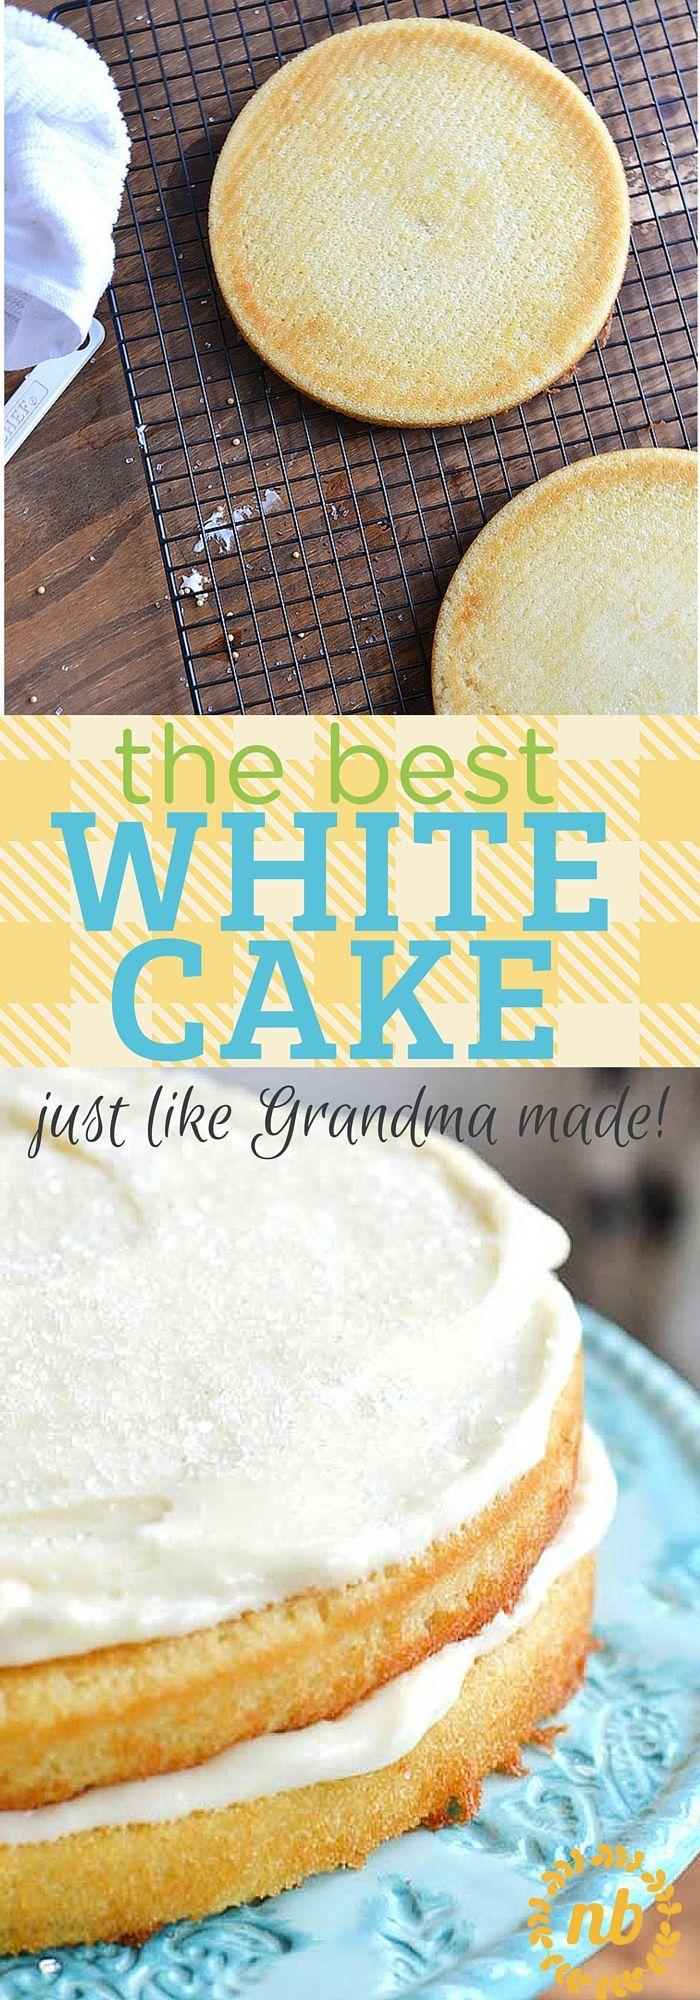 homemade white cake recipe cakes pinterest cake recipes